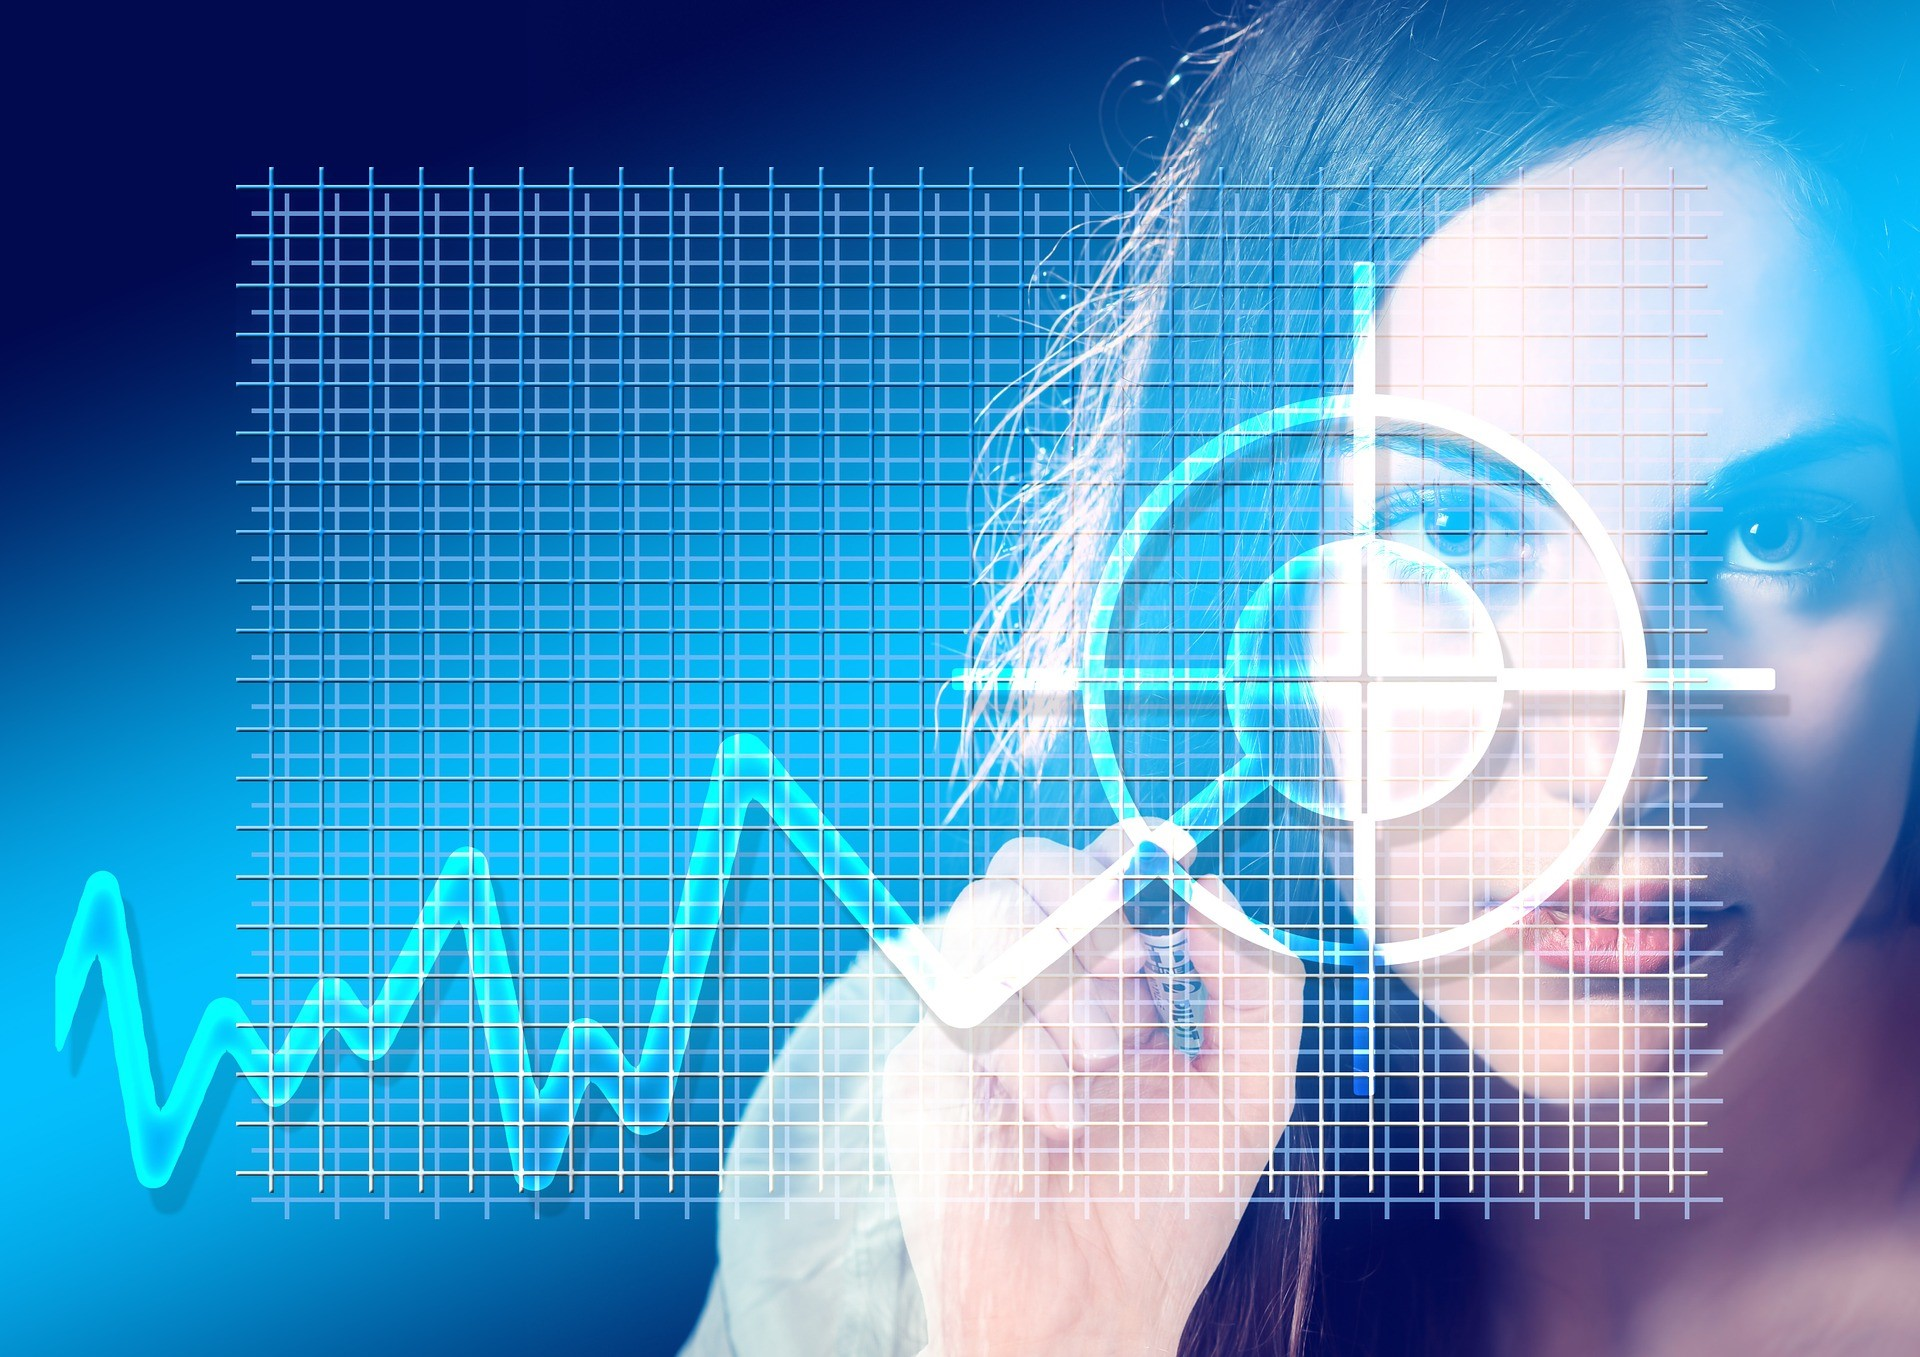 First Trust har lanserat en europeisk IPO ETF som fångar upp börsintroduktioner (ETO). First Trust IPOX Europe Equity Opportunities UCITS ETF (FPXE) är noterat på London Stock Exchange (LSE) med en total kostnadsprocent (TER) på 0,65%.